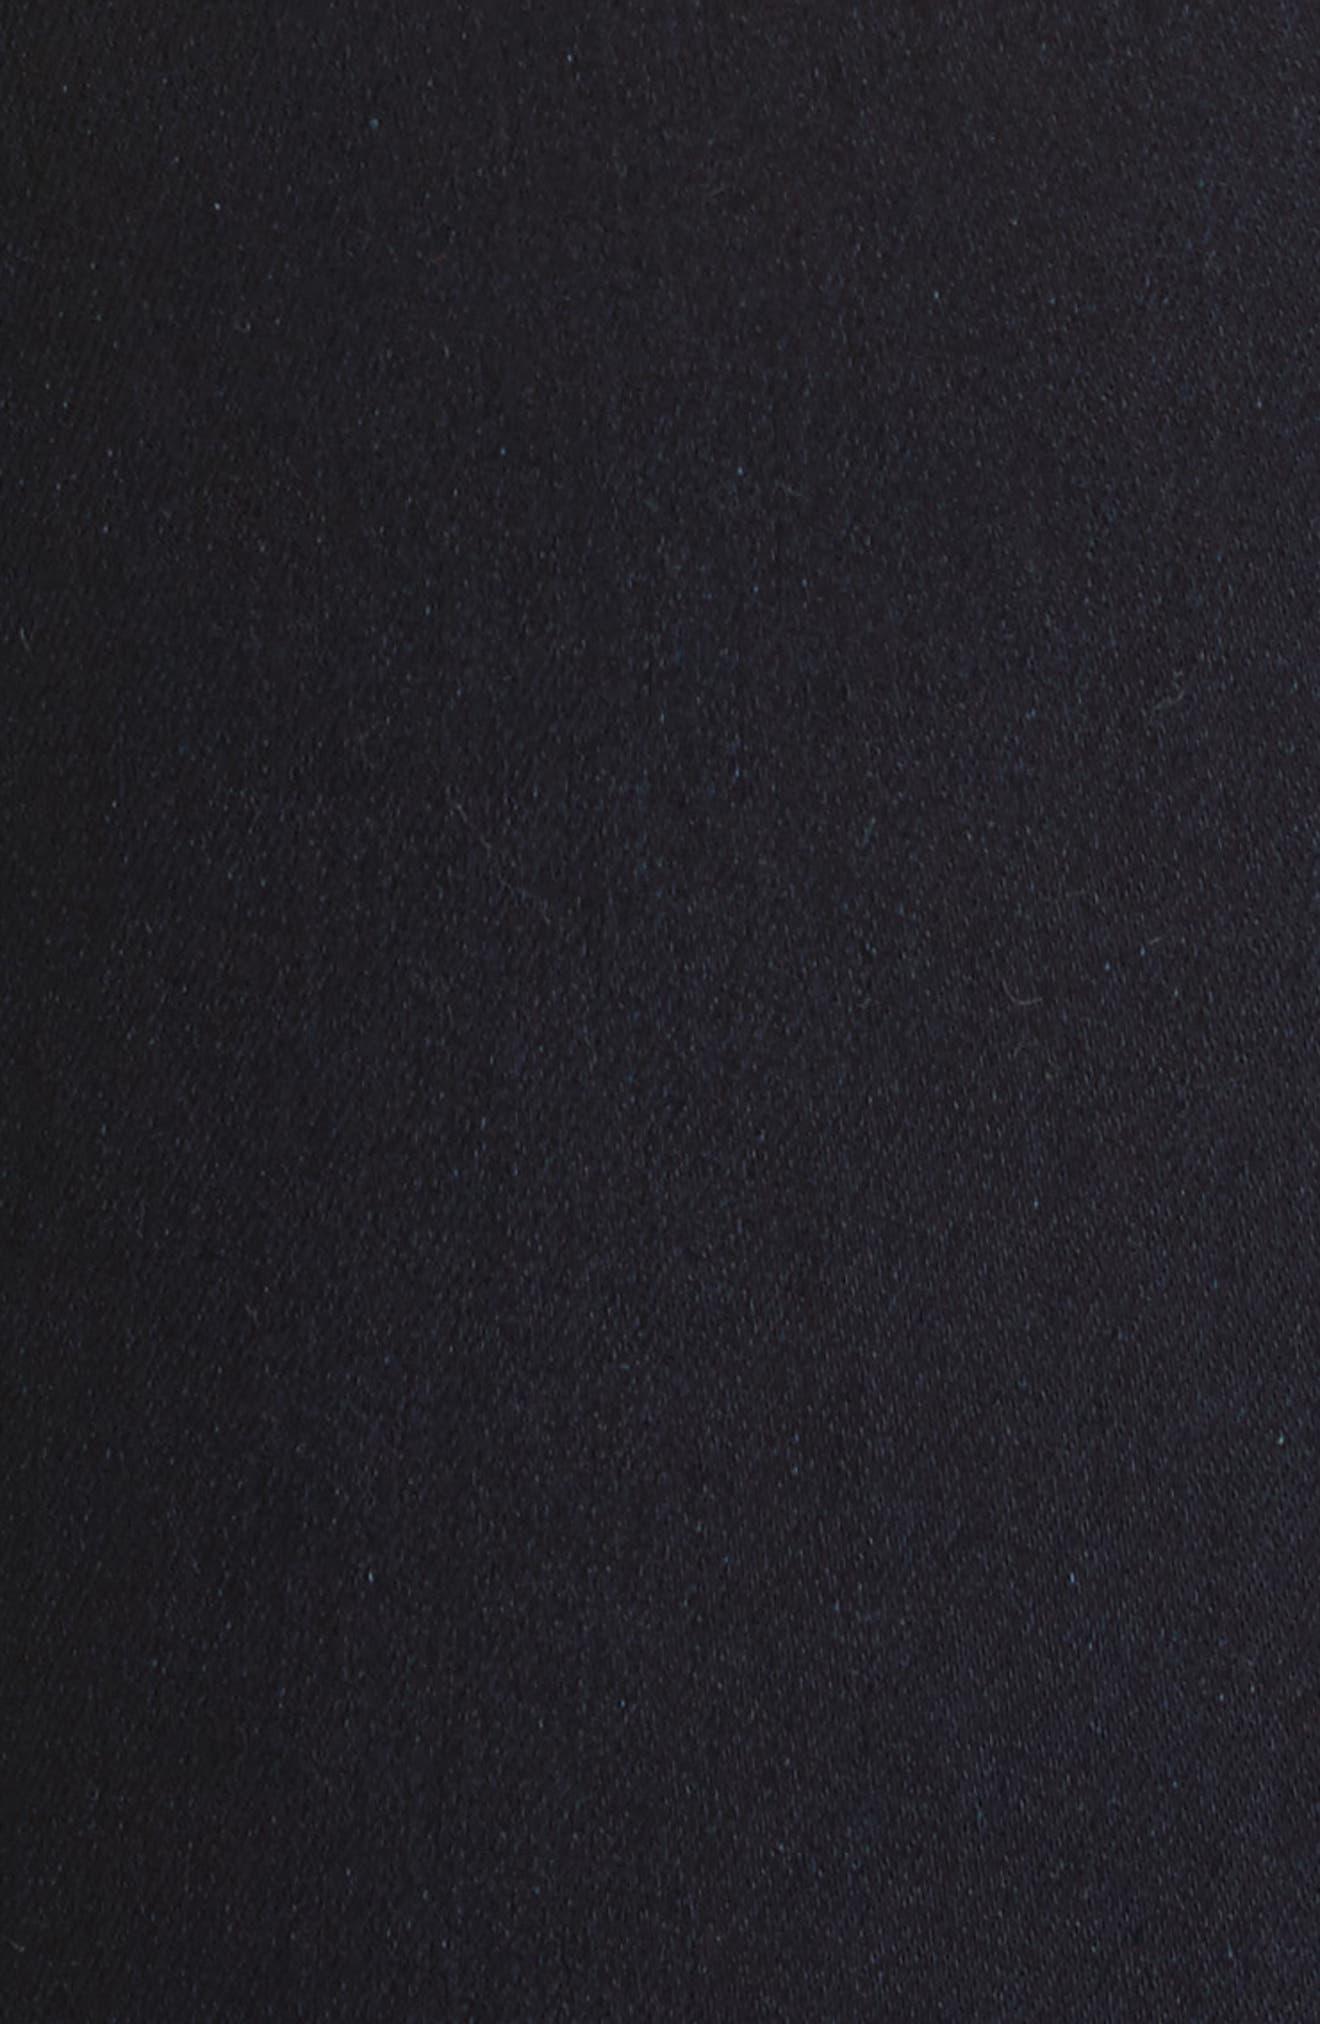 RAG & BONE,                             JEAN High Waist Ankle Skinny Jeans,                             Alternate thumbnail 5, color,                             001